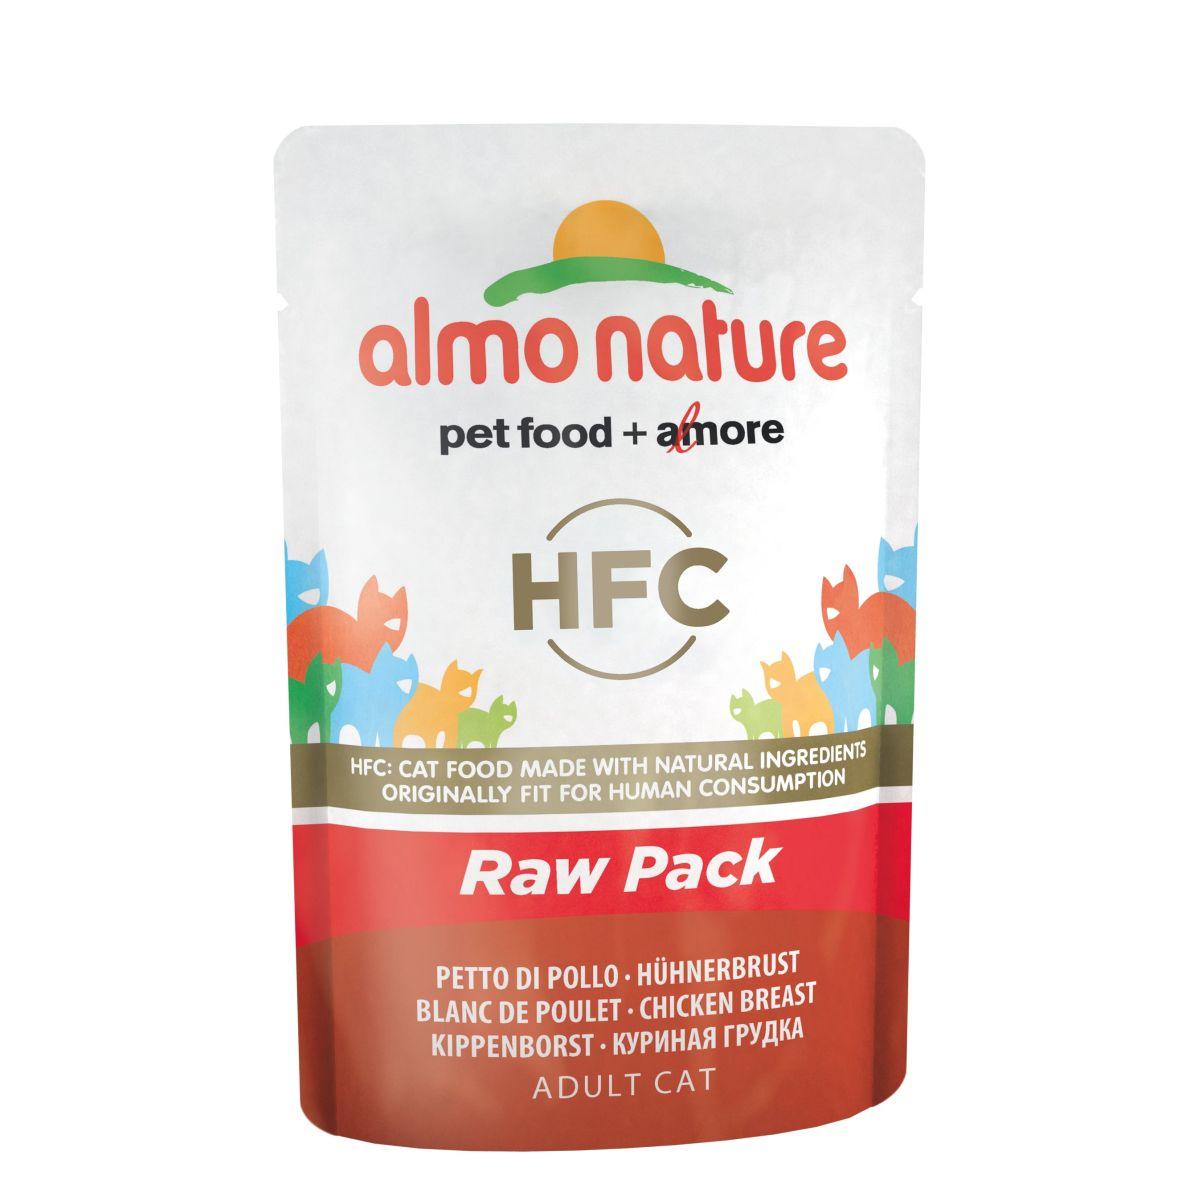 Almo Nature Classic Raw Pack Kippenborst 24 x 55 gr